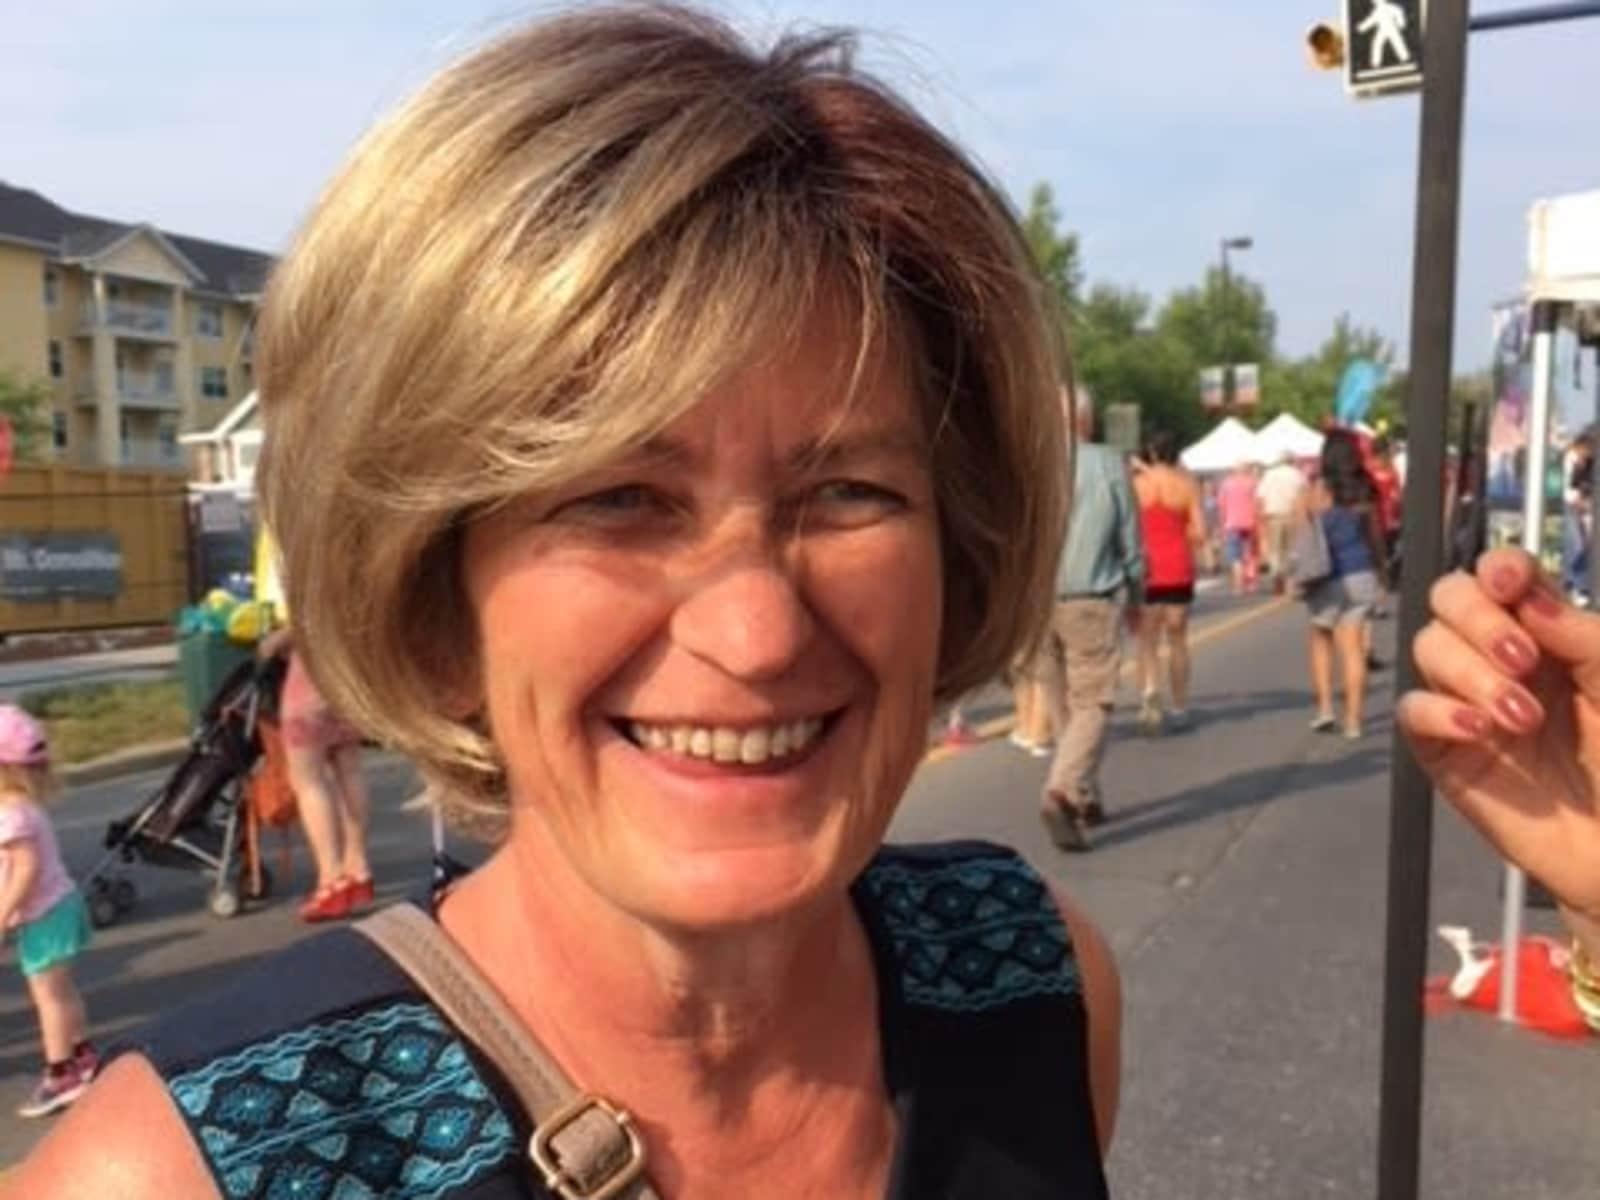 Wilma mclean from Calgary, Alberta, Canada